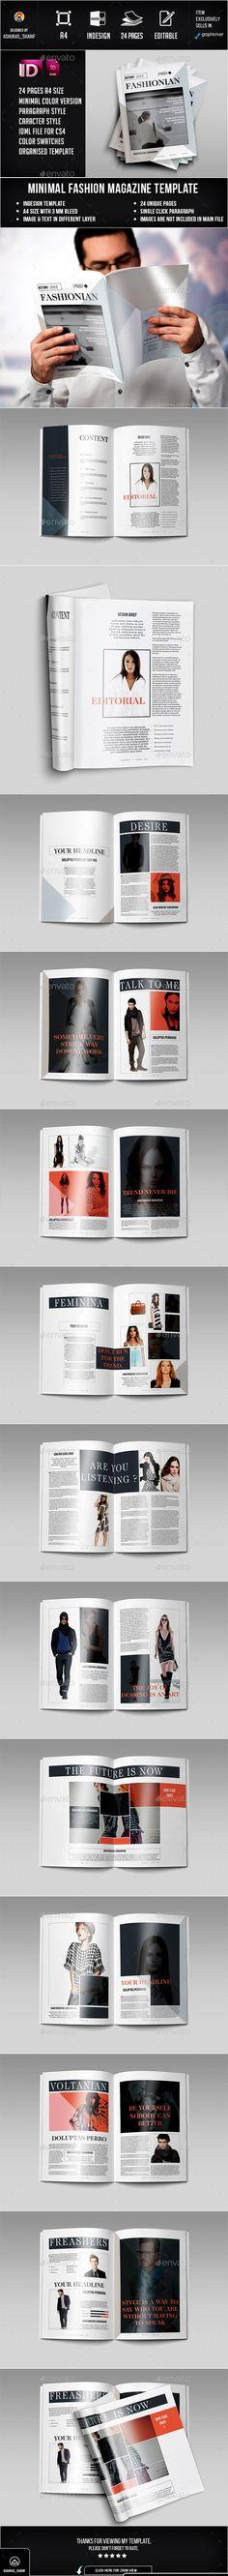 Fashion Magazine 24 Page Layout Template InDesign INDD #design #journal Download: http://graphicriver.net/item/fashion-magazine-02/13116504?ref=ksioks